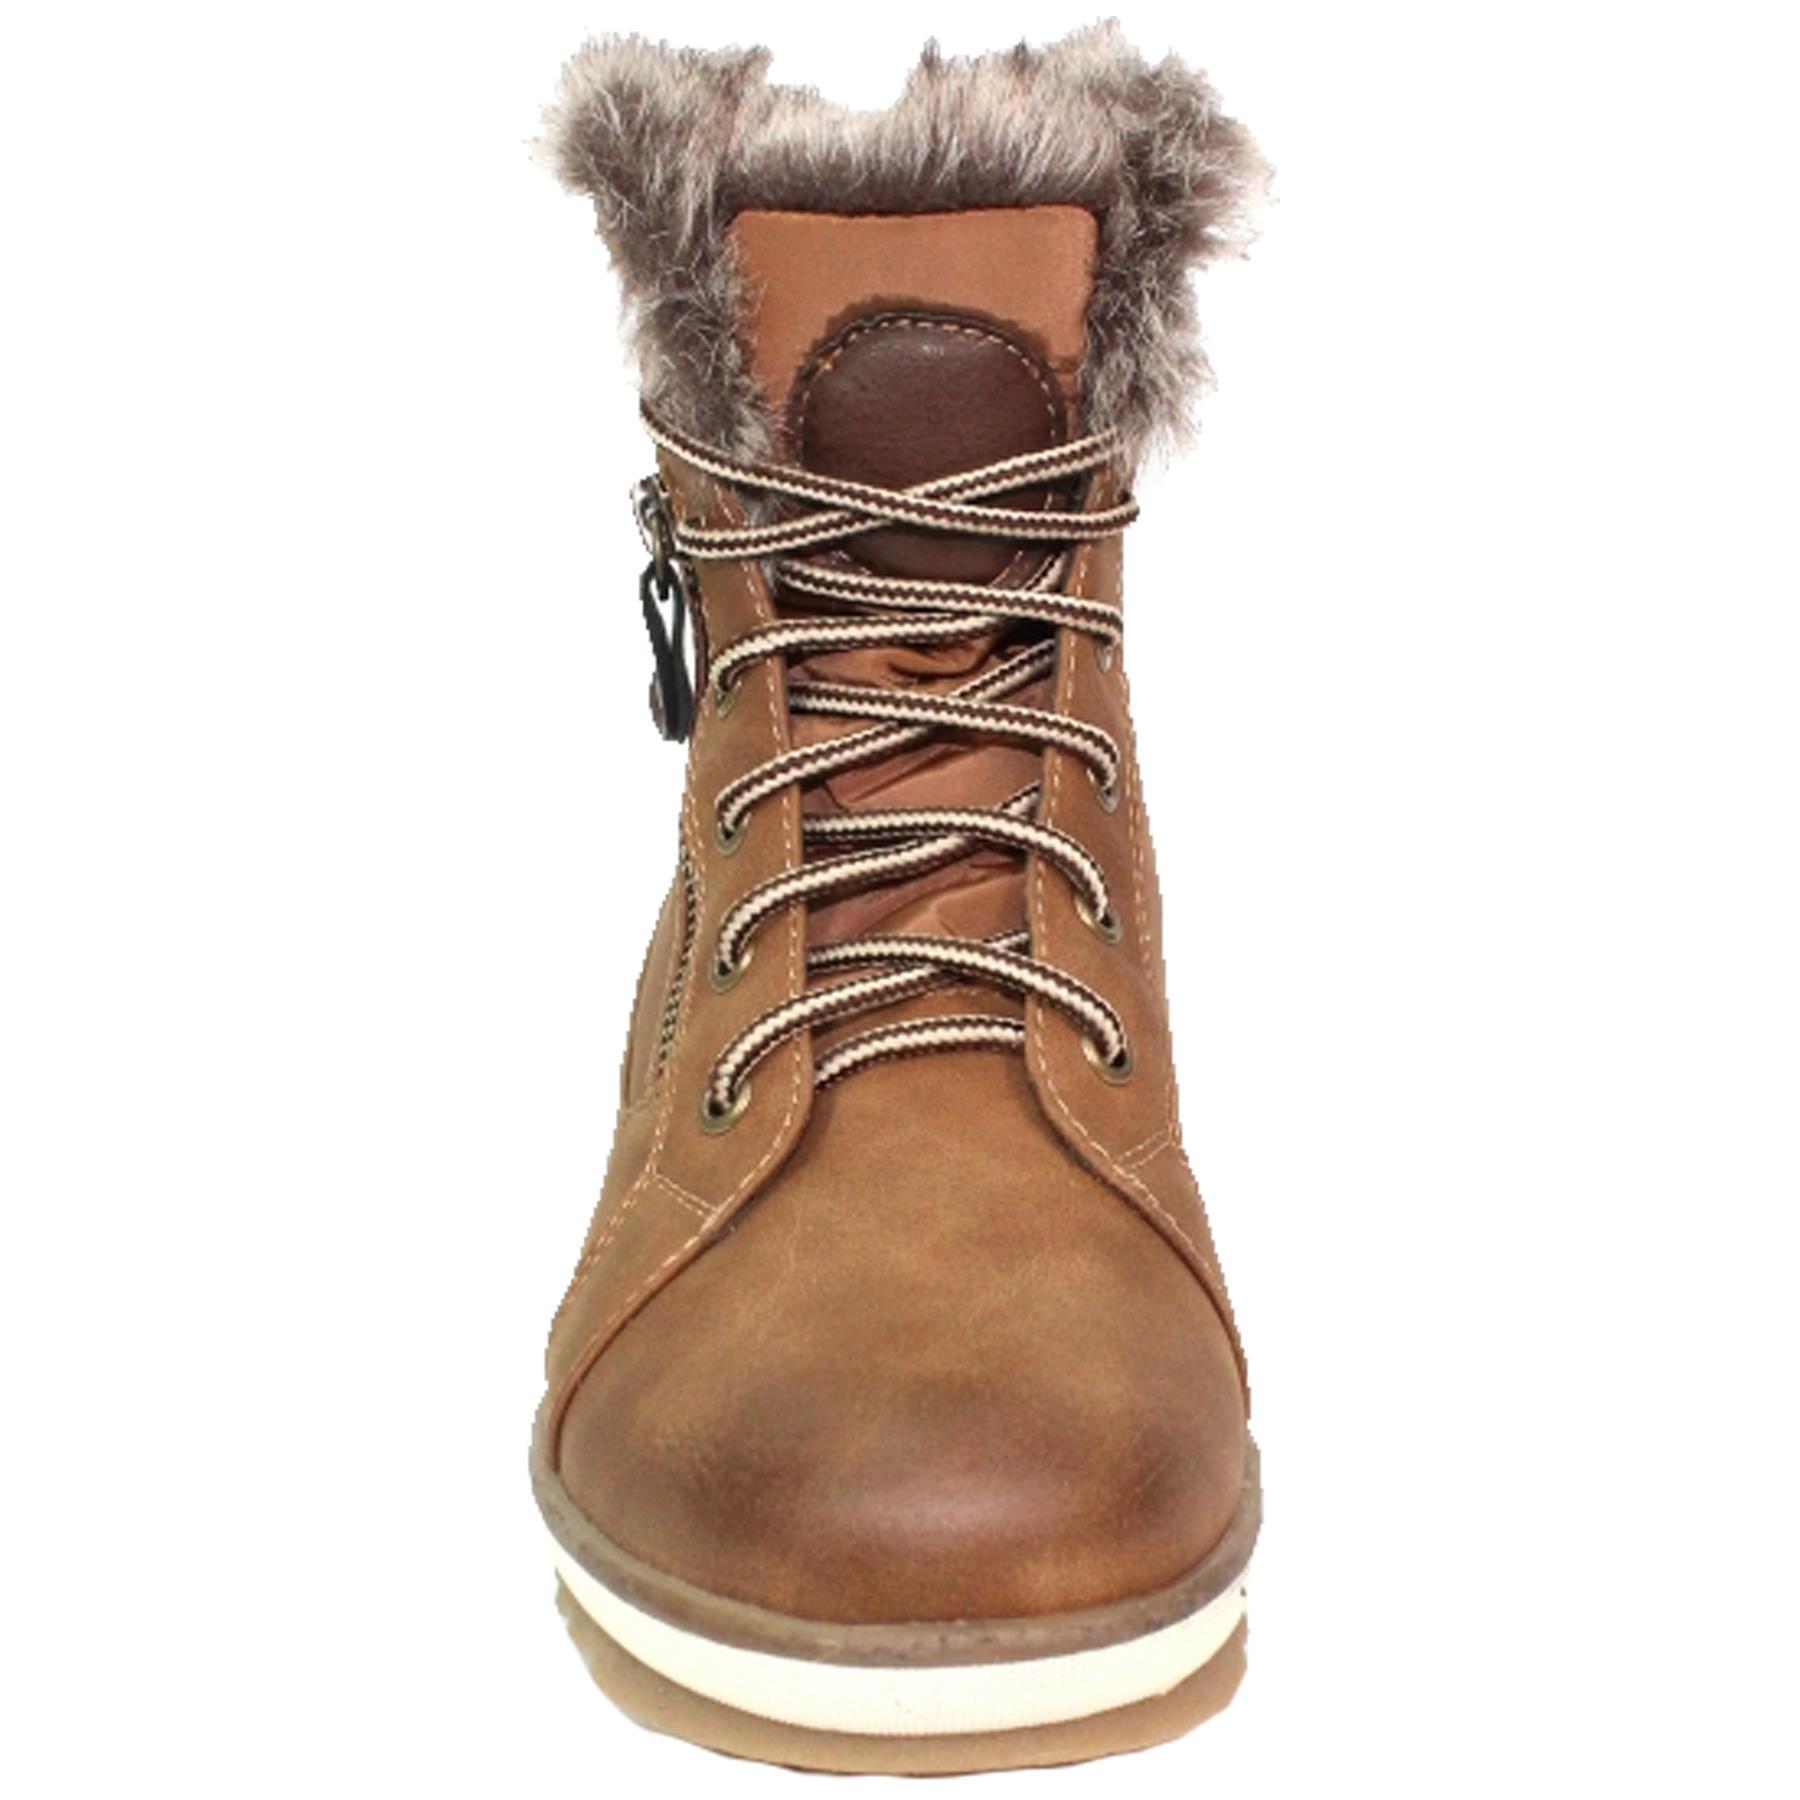 Amelia Zipper Shoe Padded Insole Comfort Faux Fur Lace Up Flat Boots